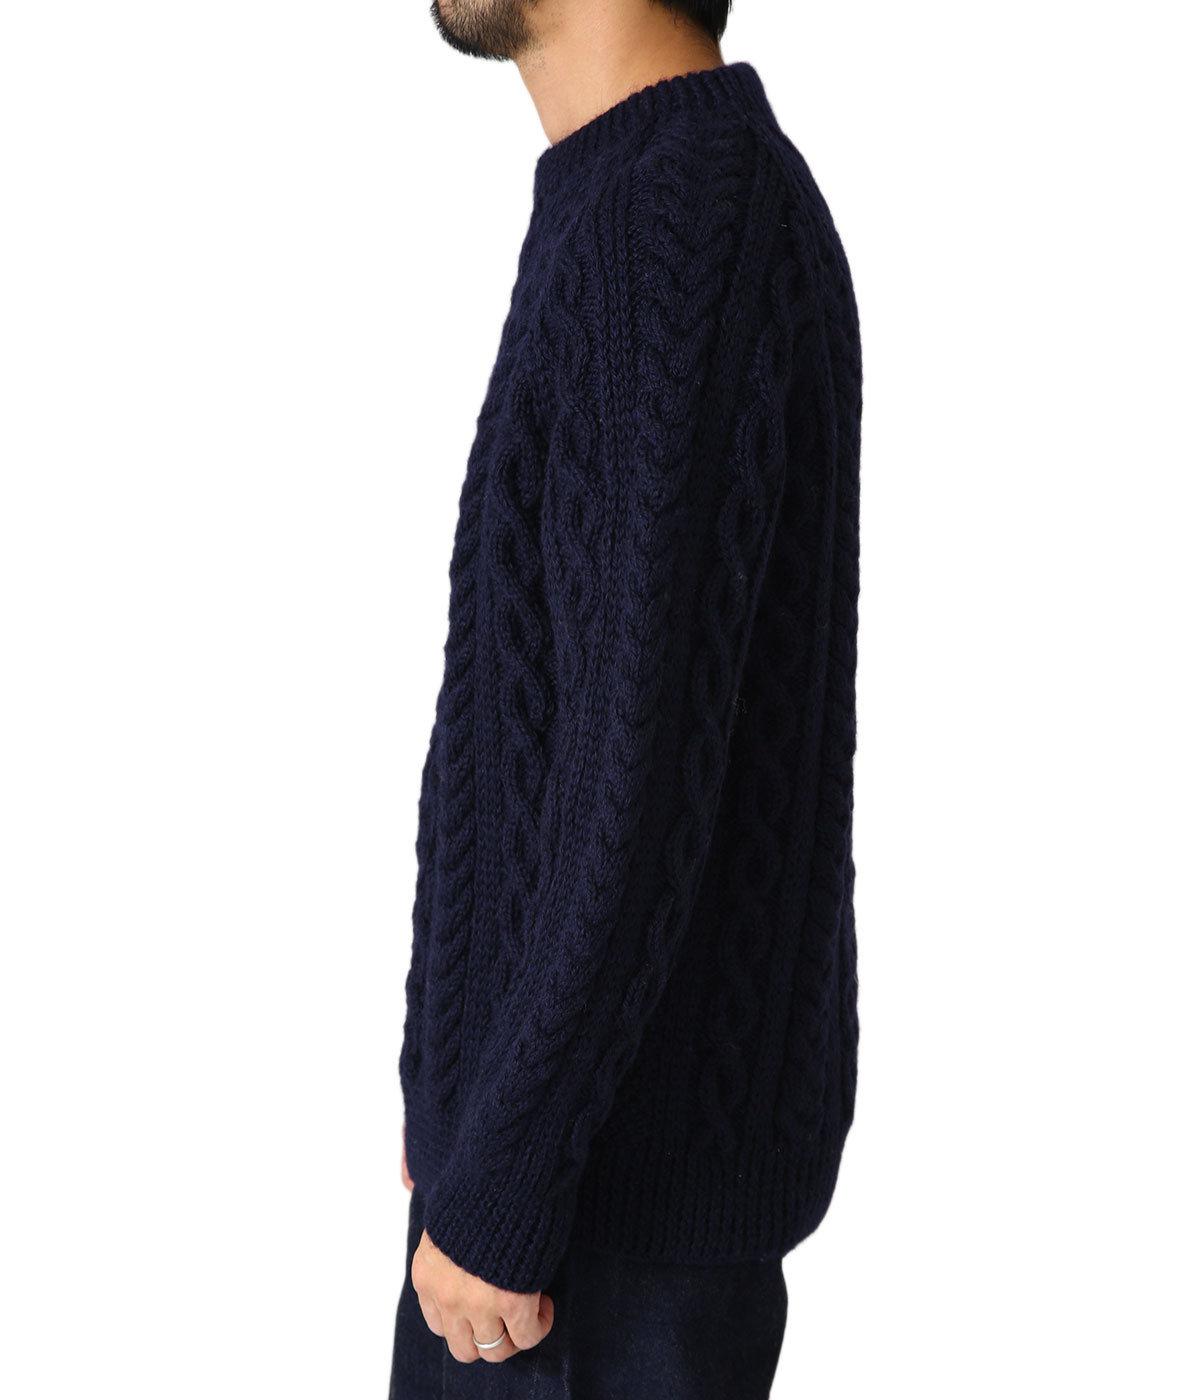 Crewneck Sweater (Size:44)